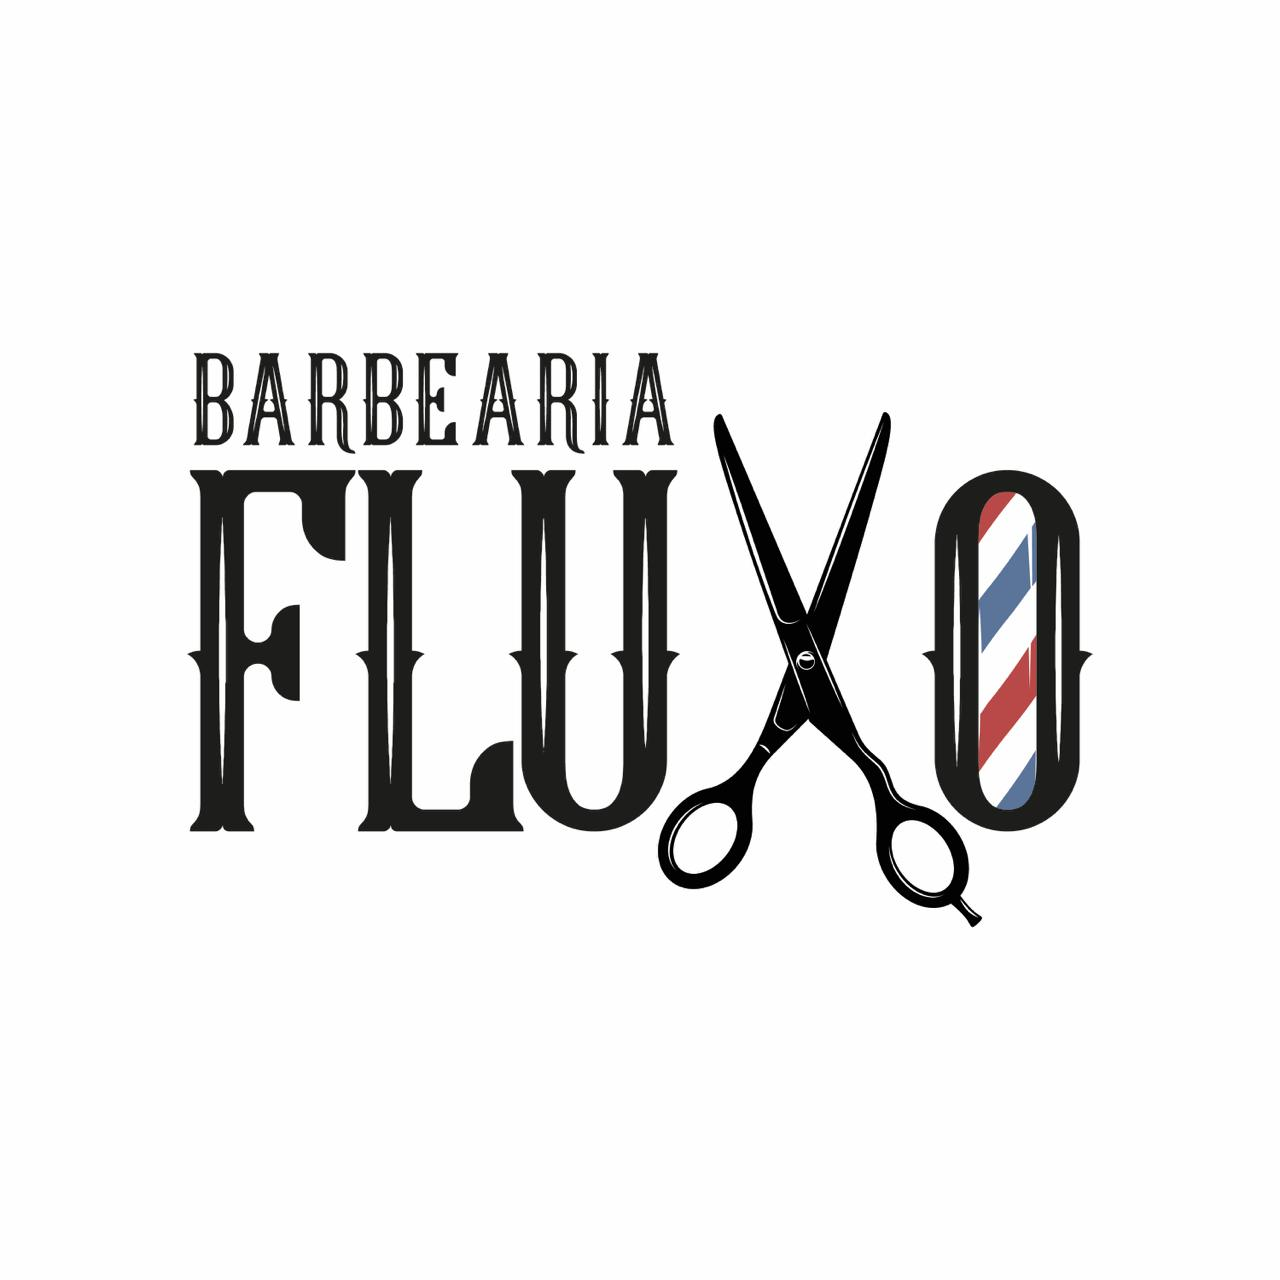 Barbearia Fluxo